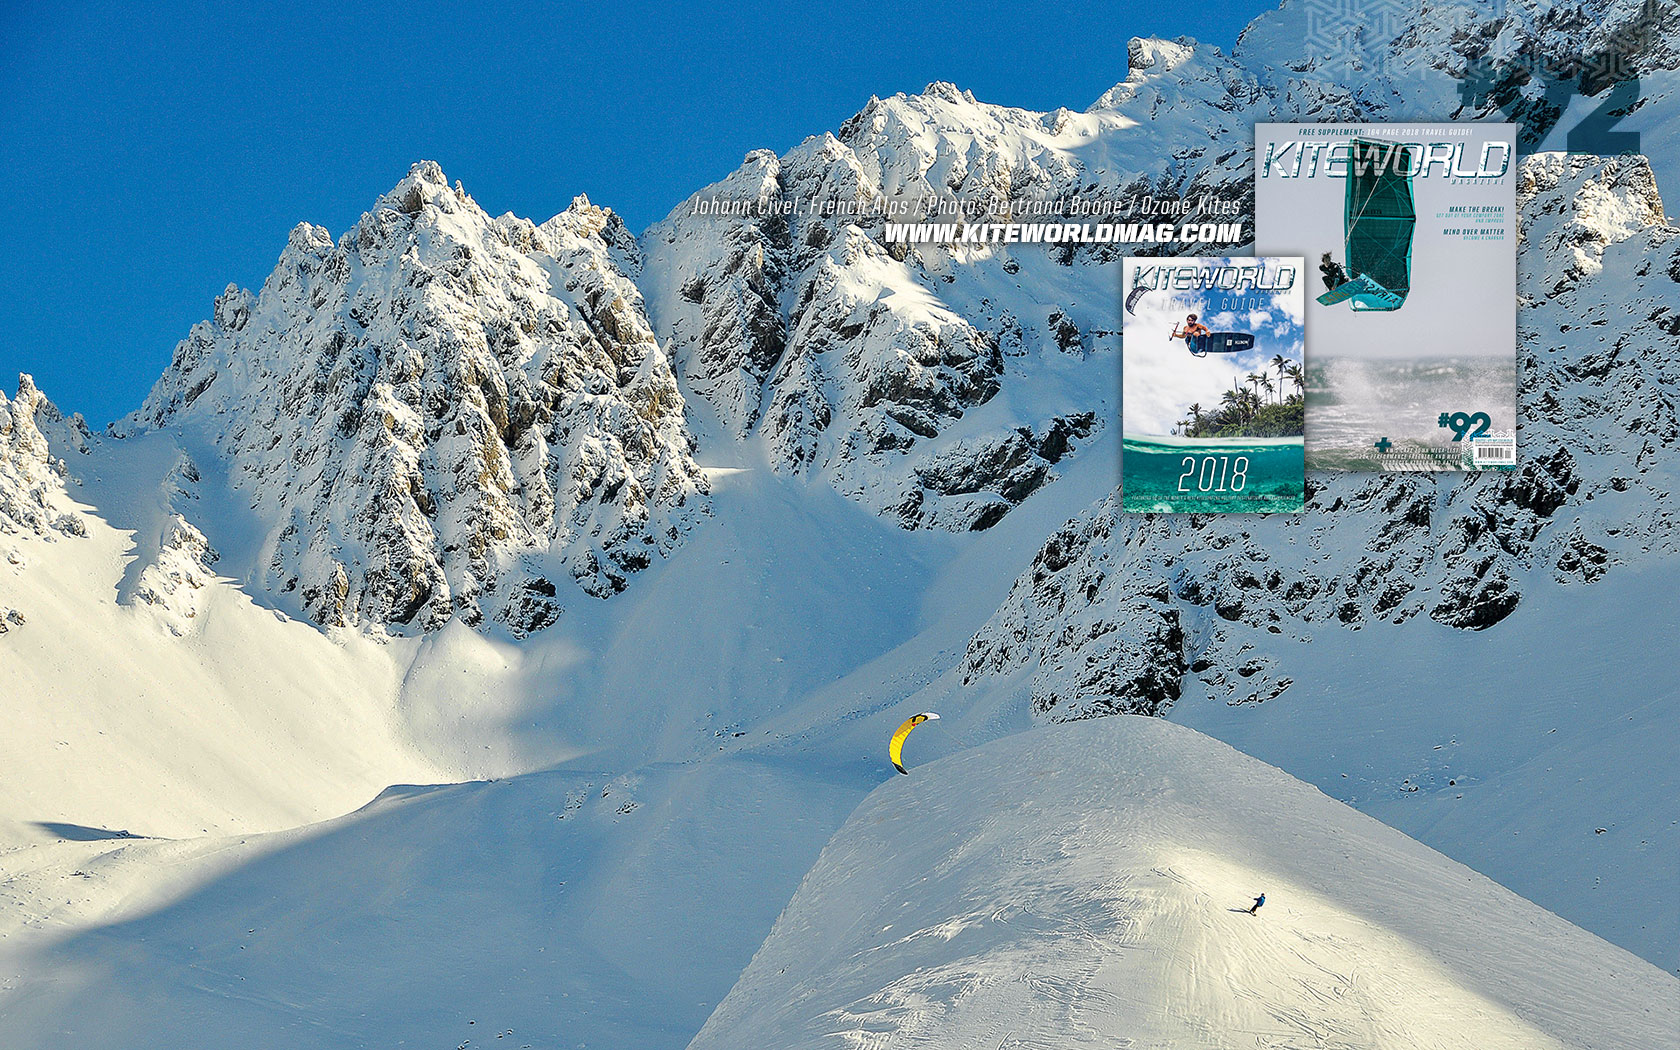 Johann Civel, French Alps - Kiteworld Magazine Gallery 92